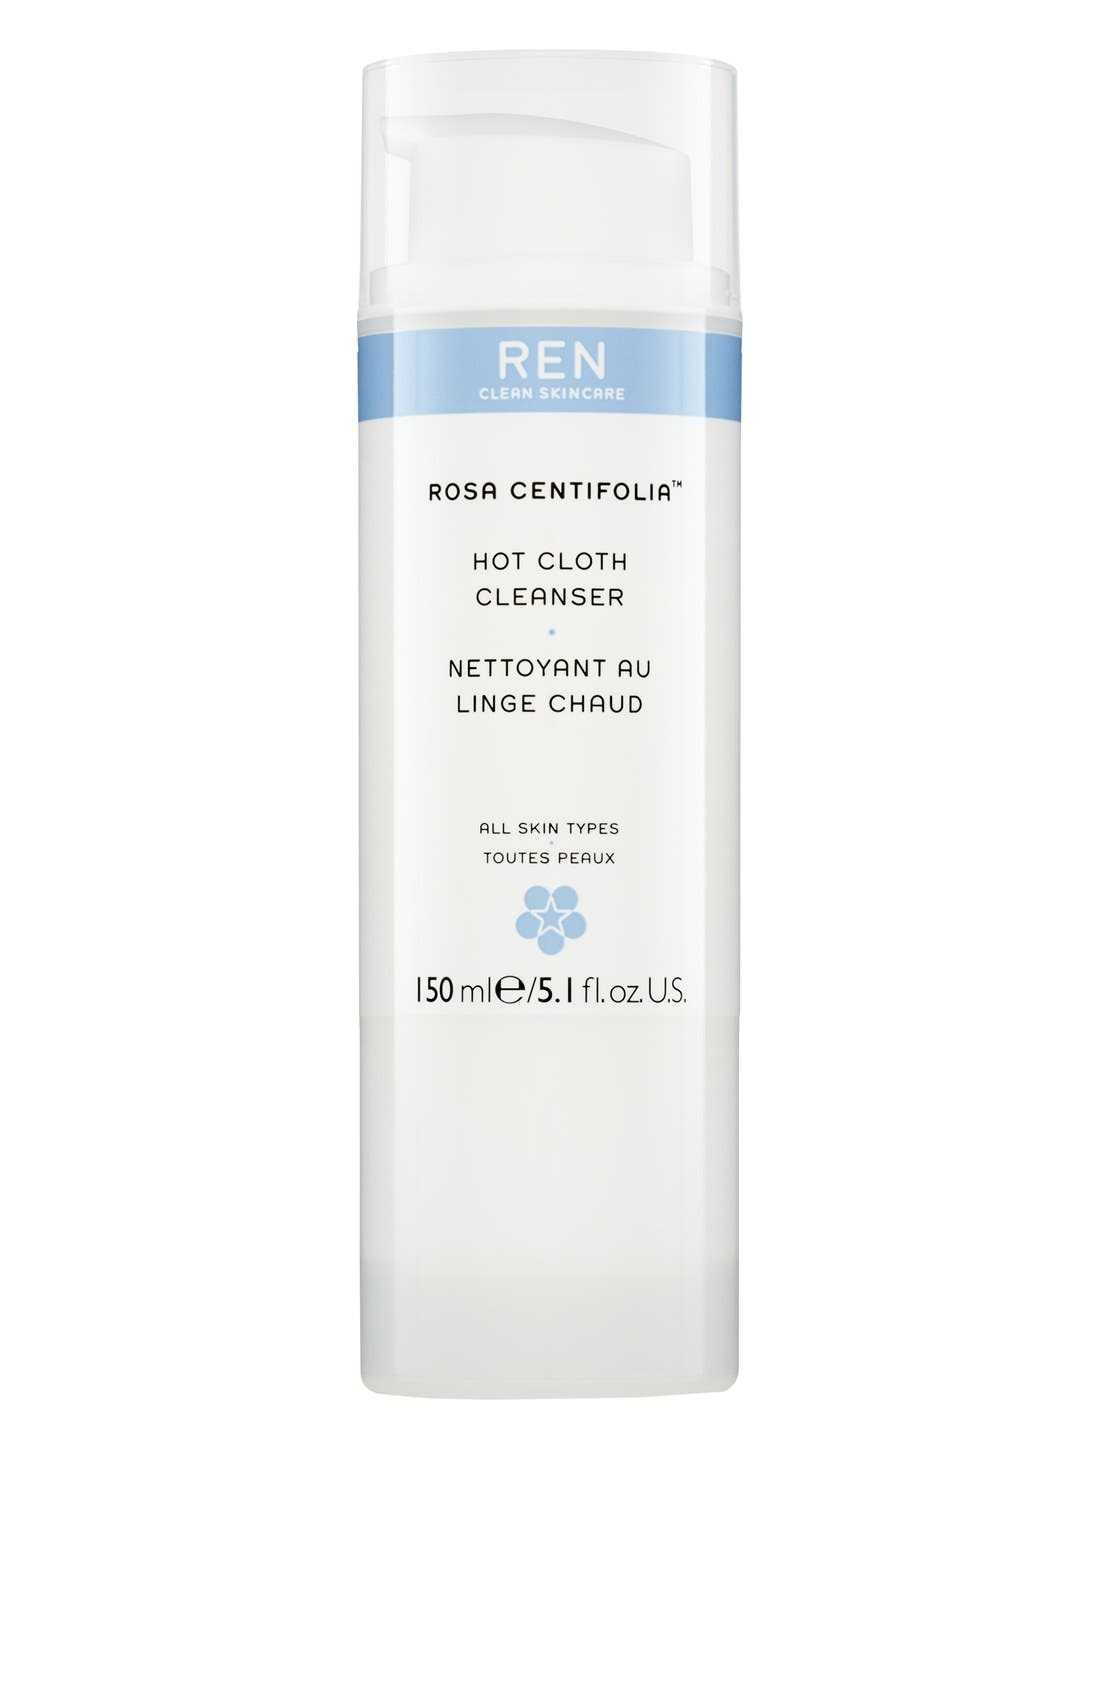 REN 'Rosa Centifolia™' Hot Cloth Cleanser